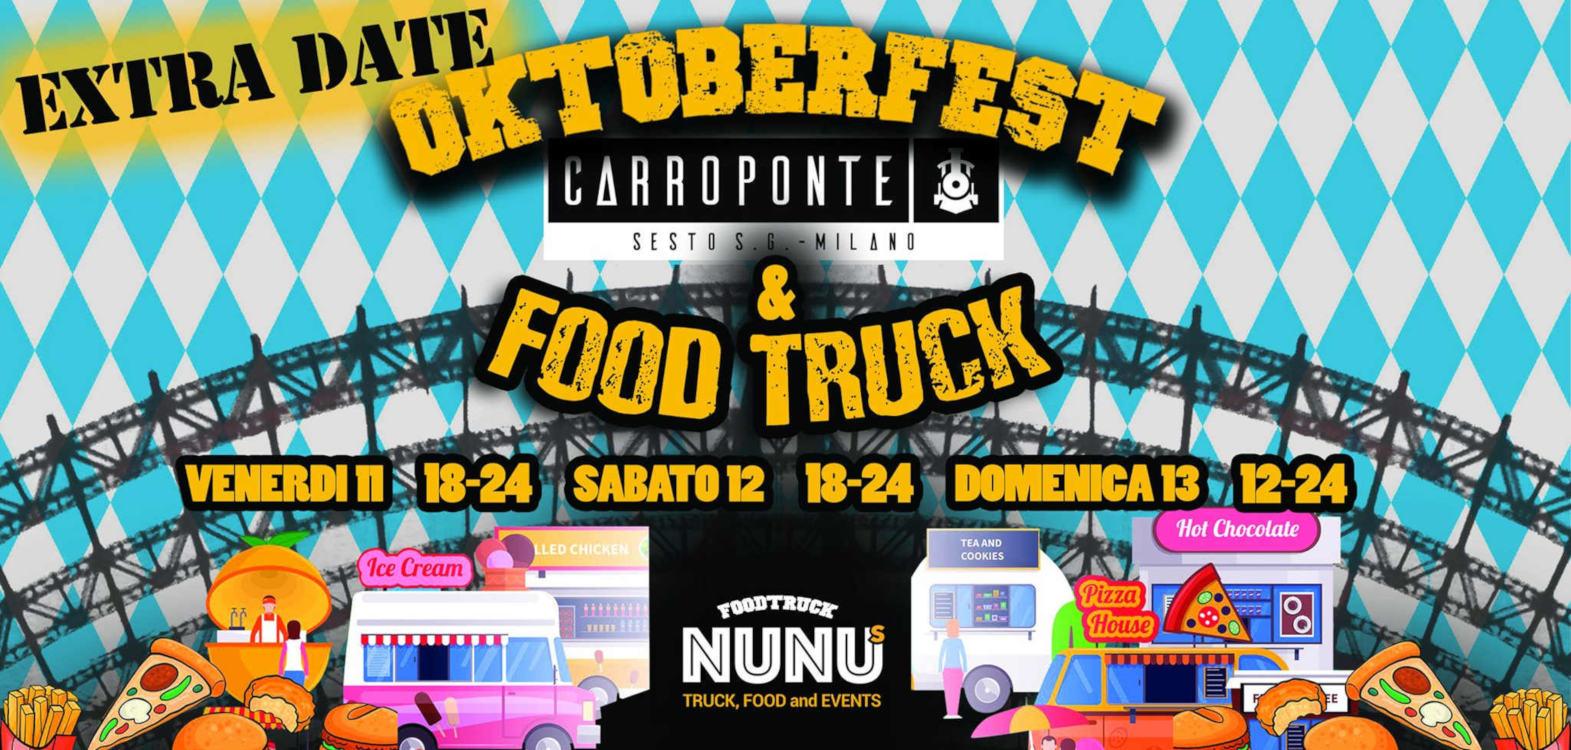 oktoberfest carroponte 2019